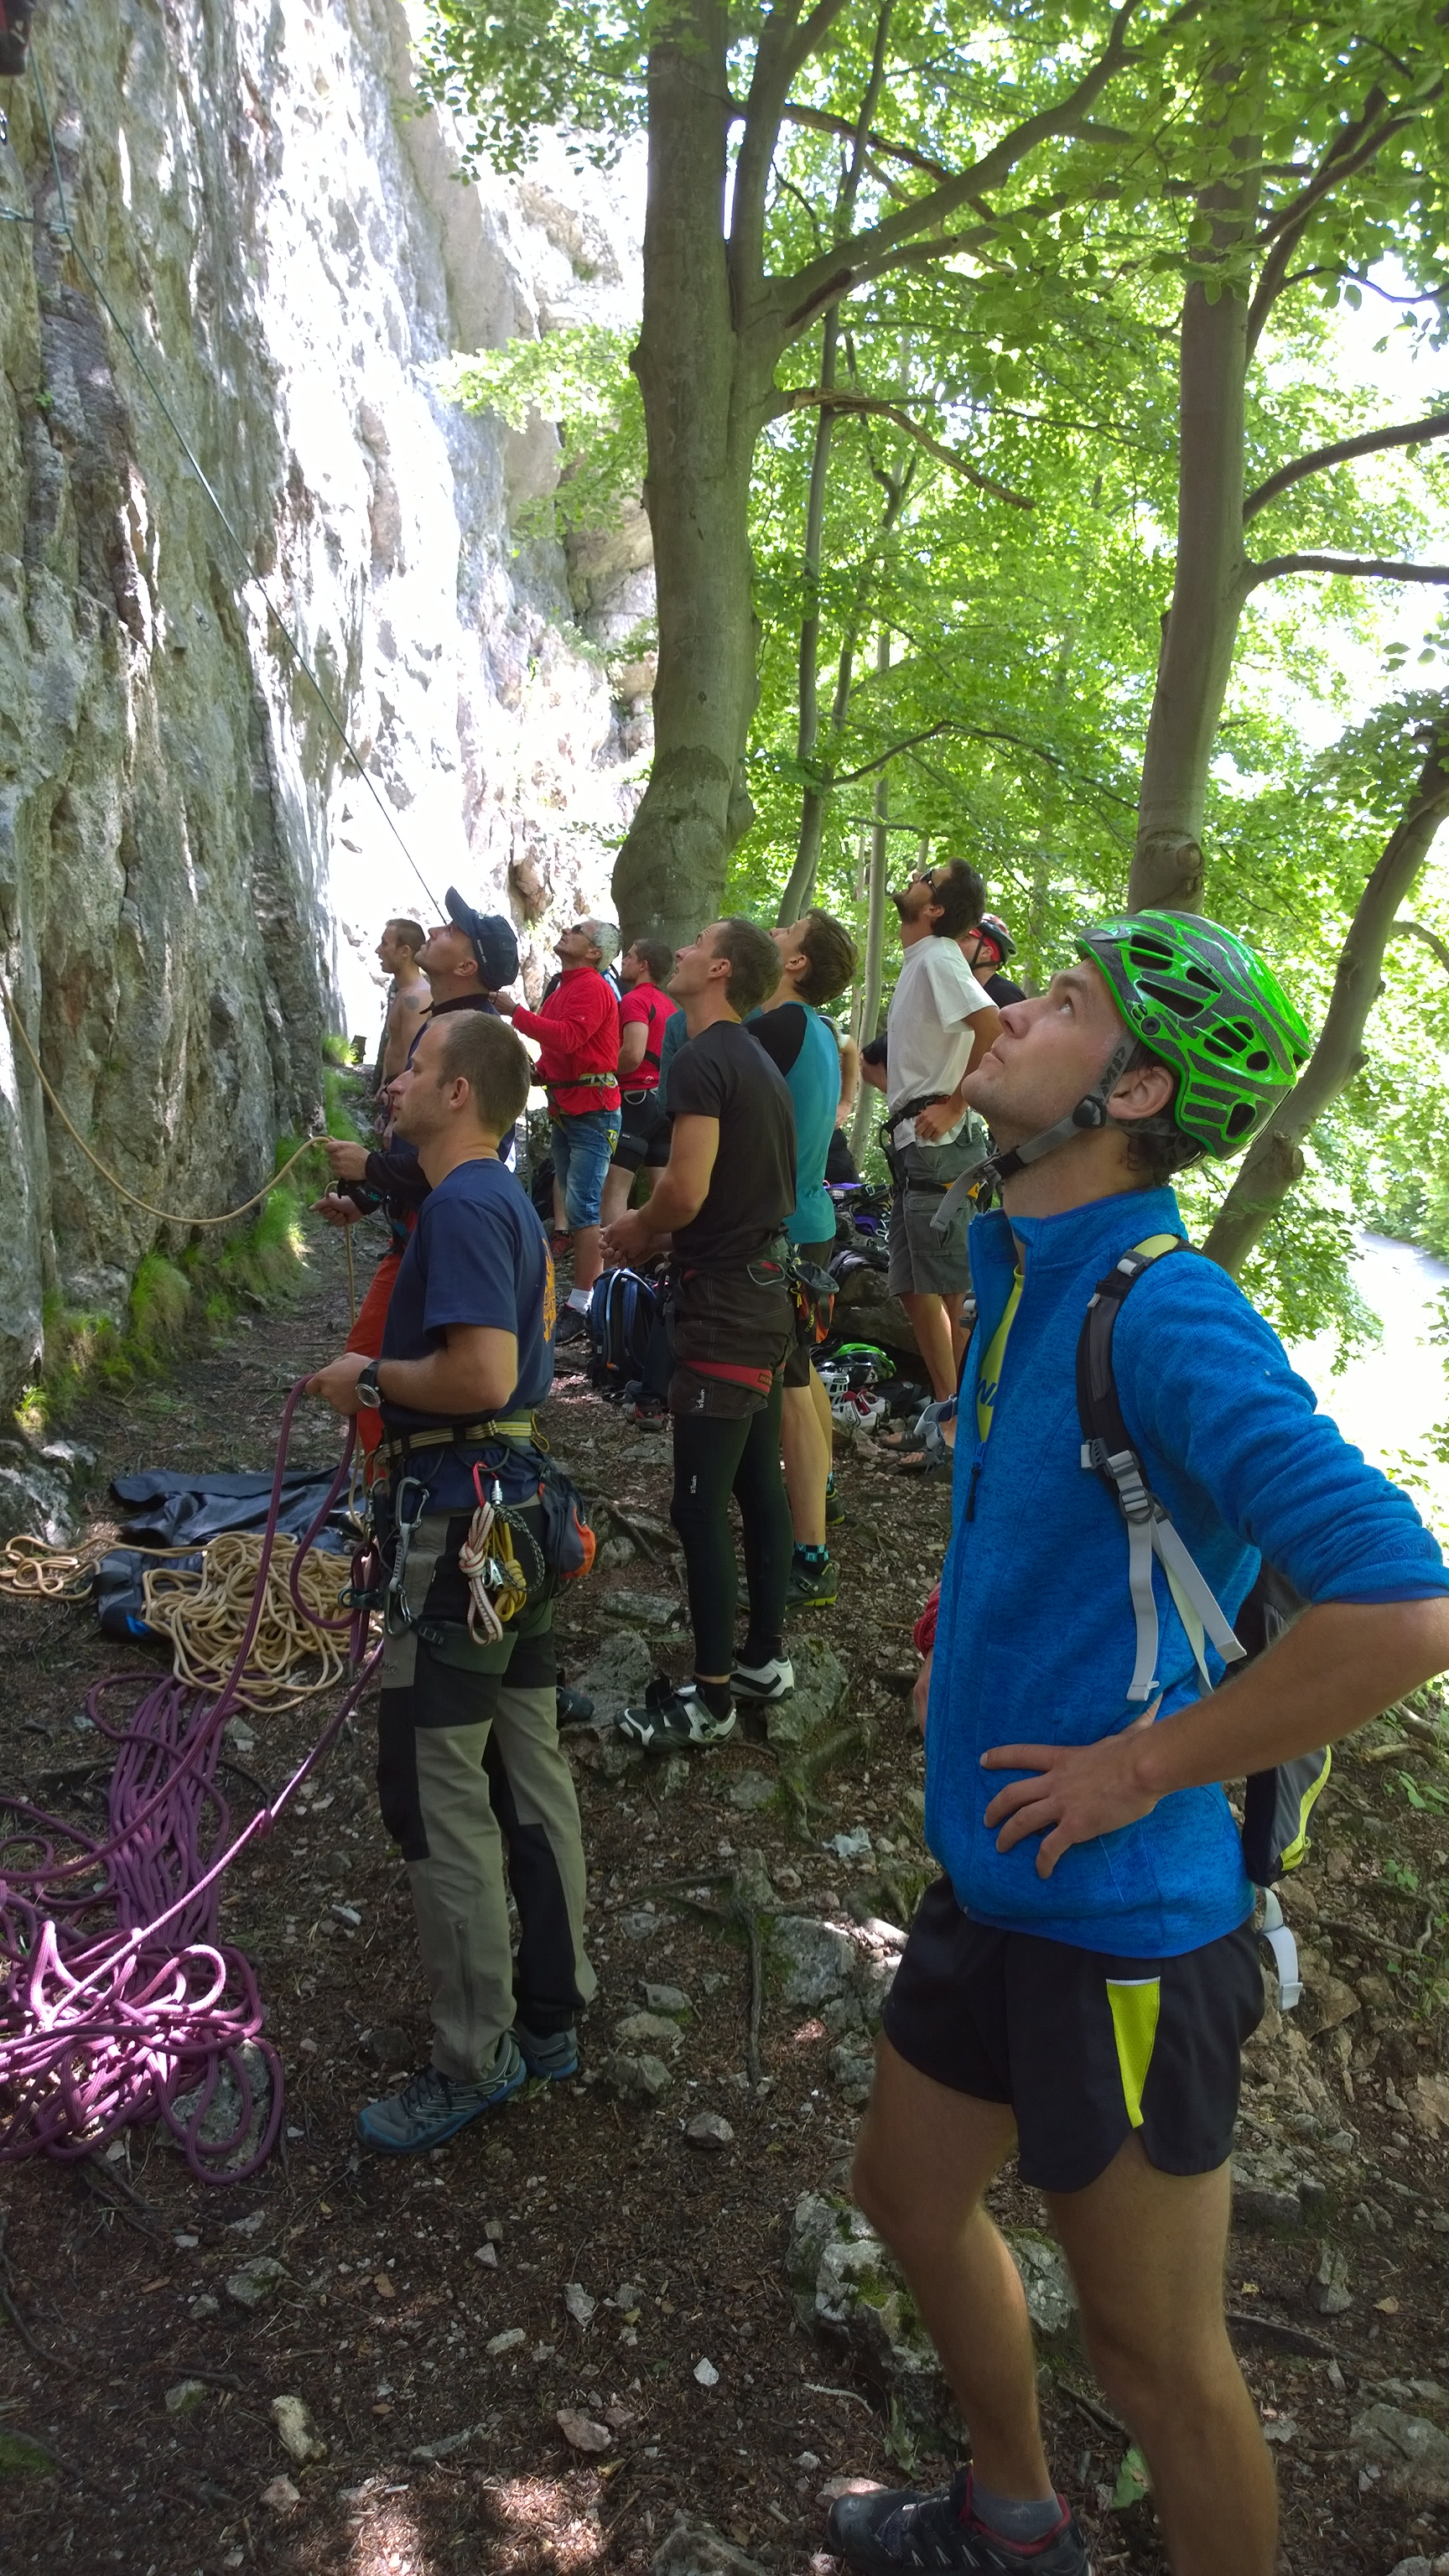 Uz sme pod skalami na horolezeckom triatlone v priedhori